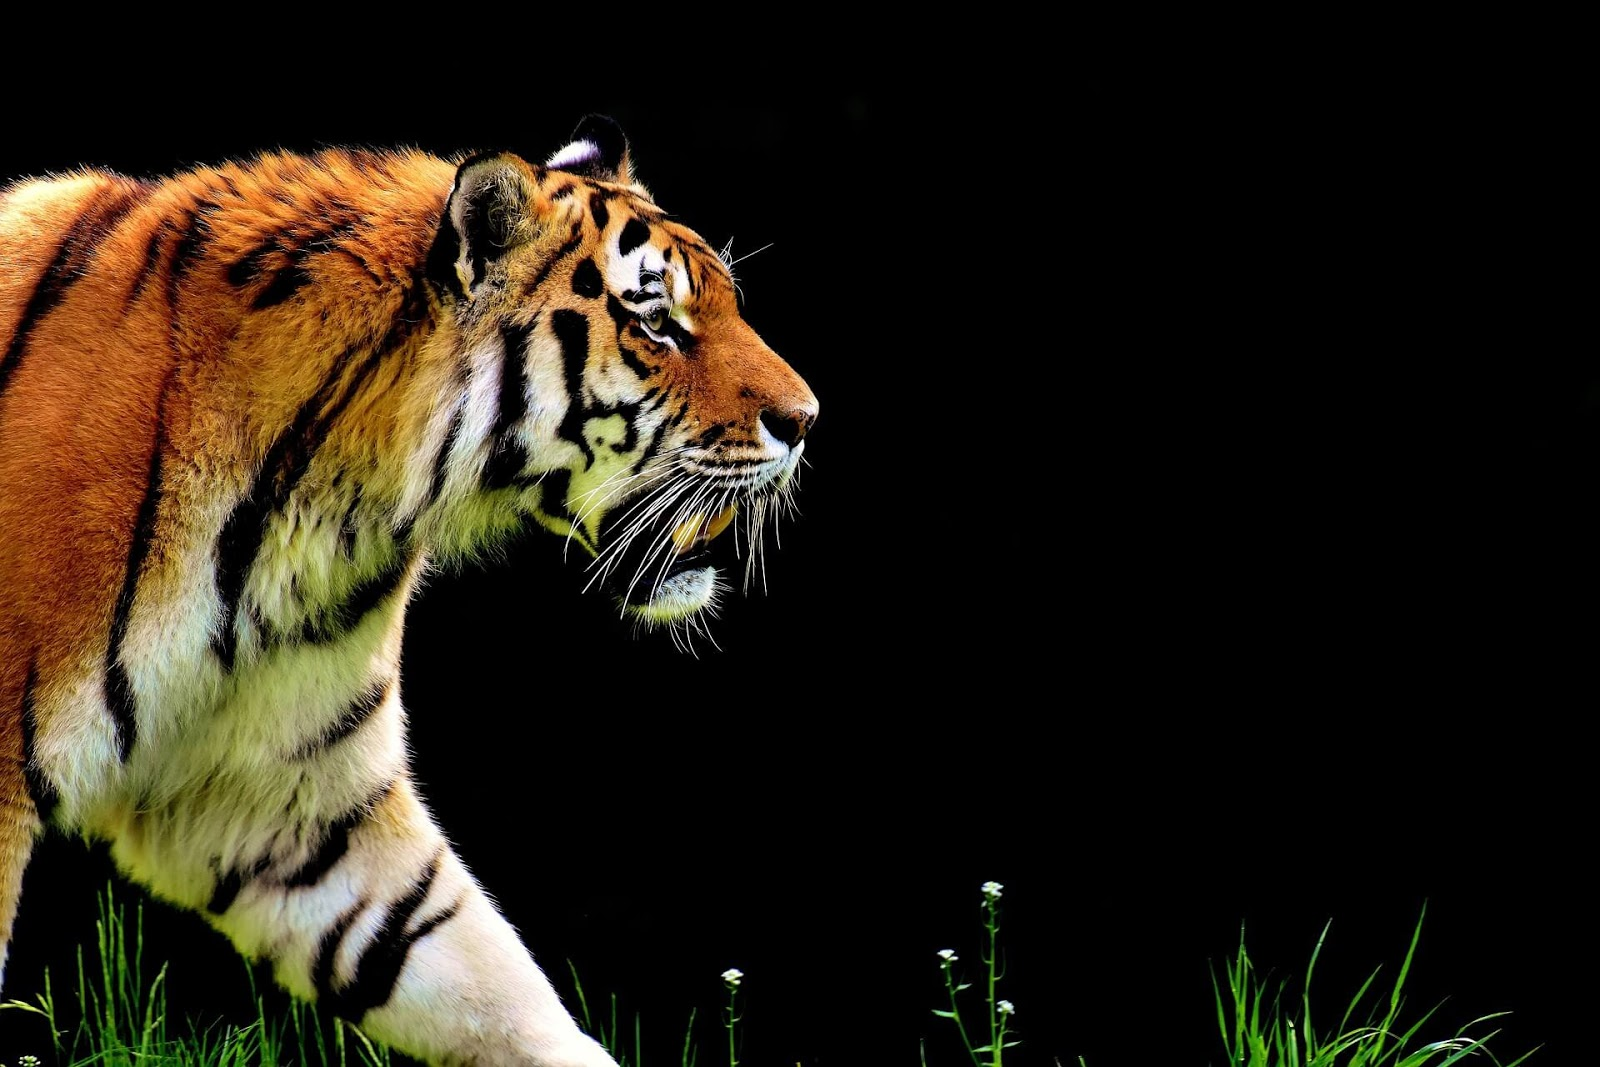 tiger images free download